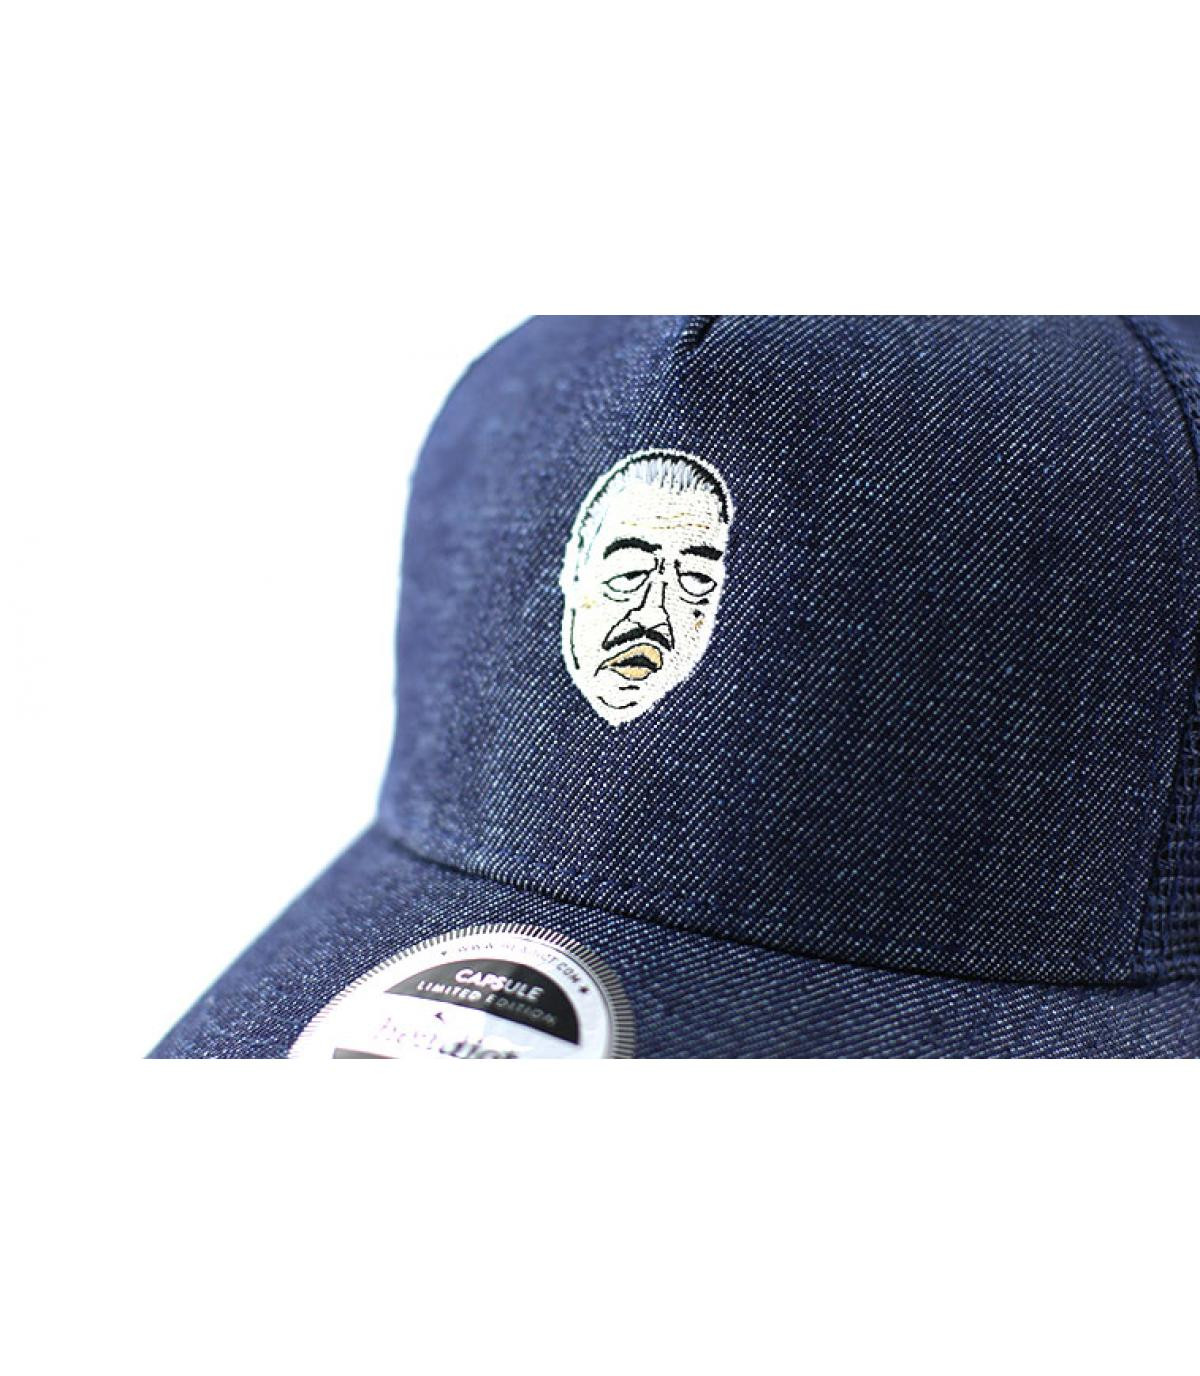 Details Trucker Don Corleone denim blue - afbeeling 3